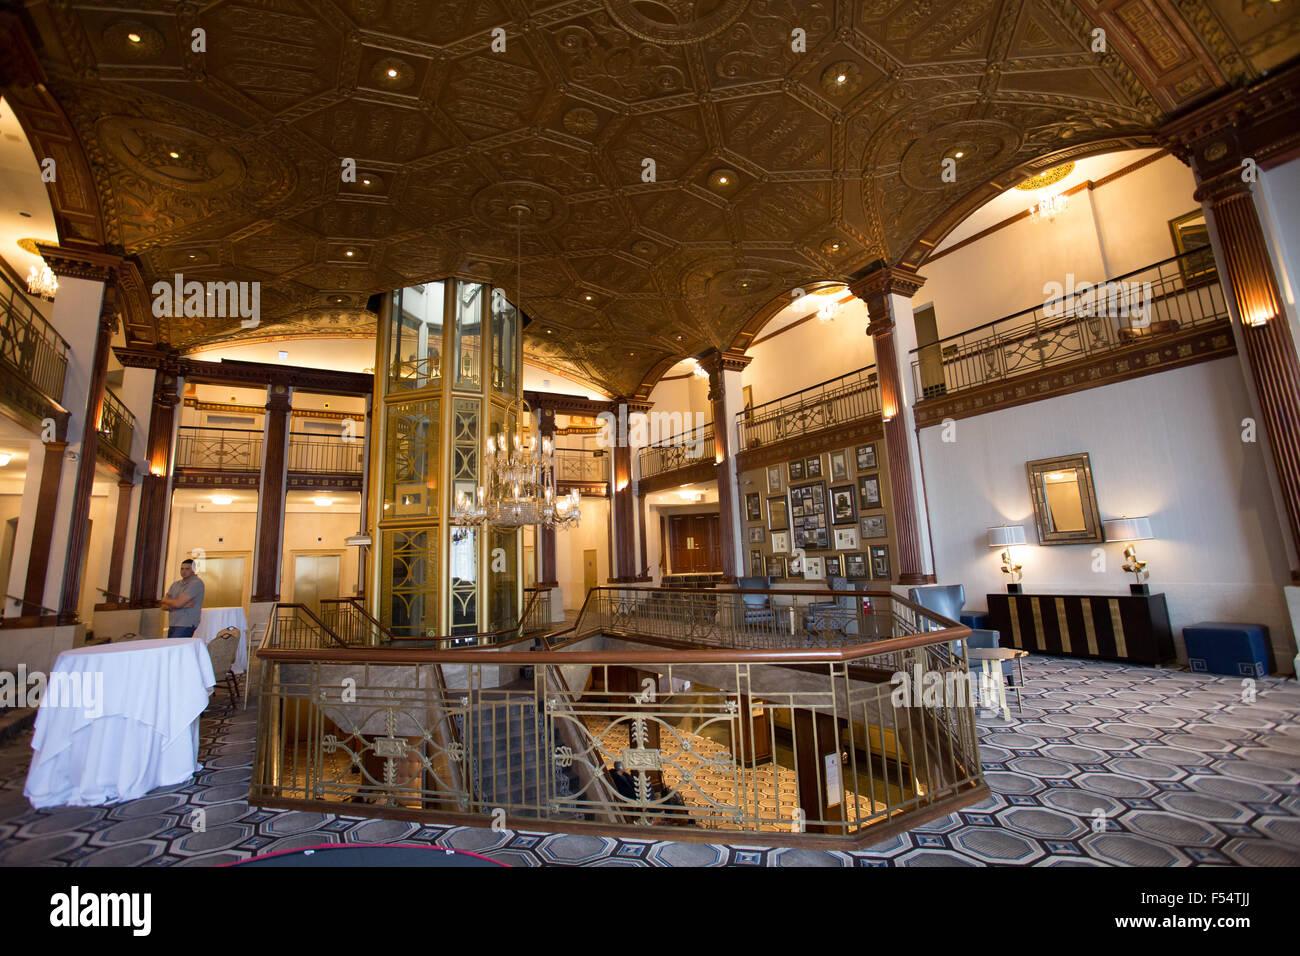 inside providence biltmore hotel - Stock Image